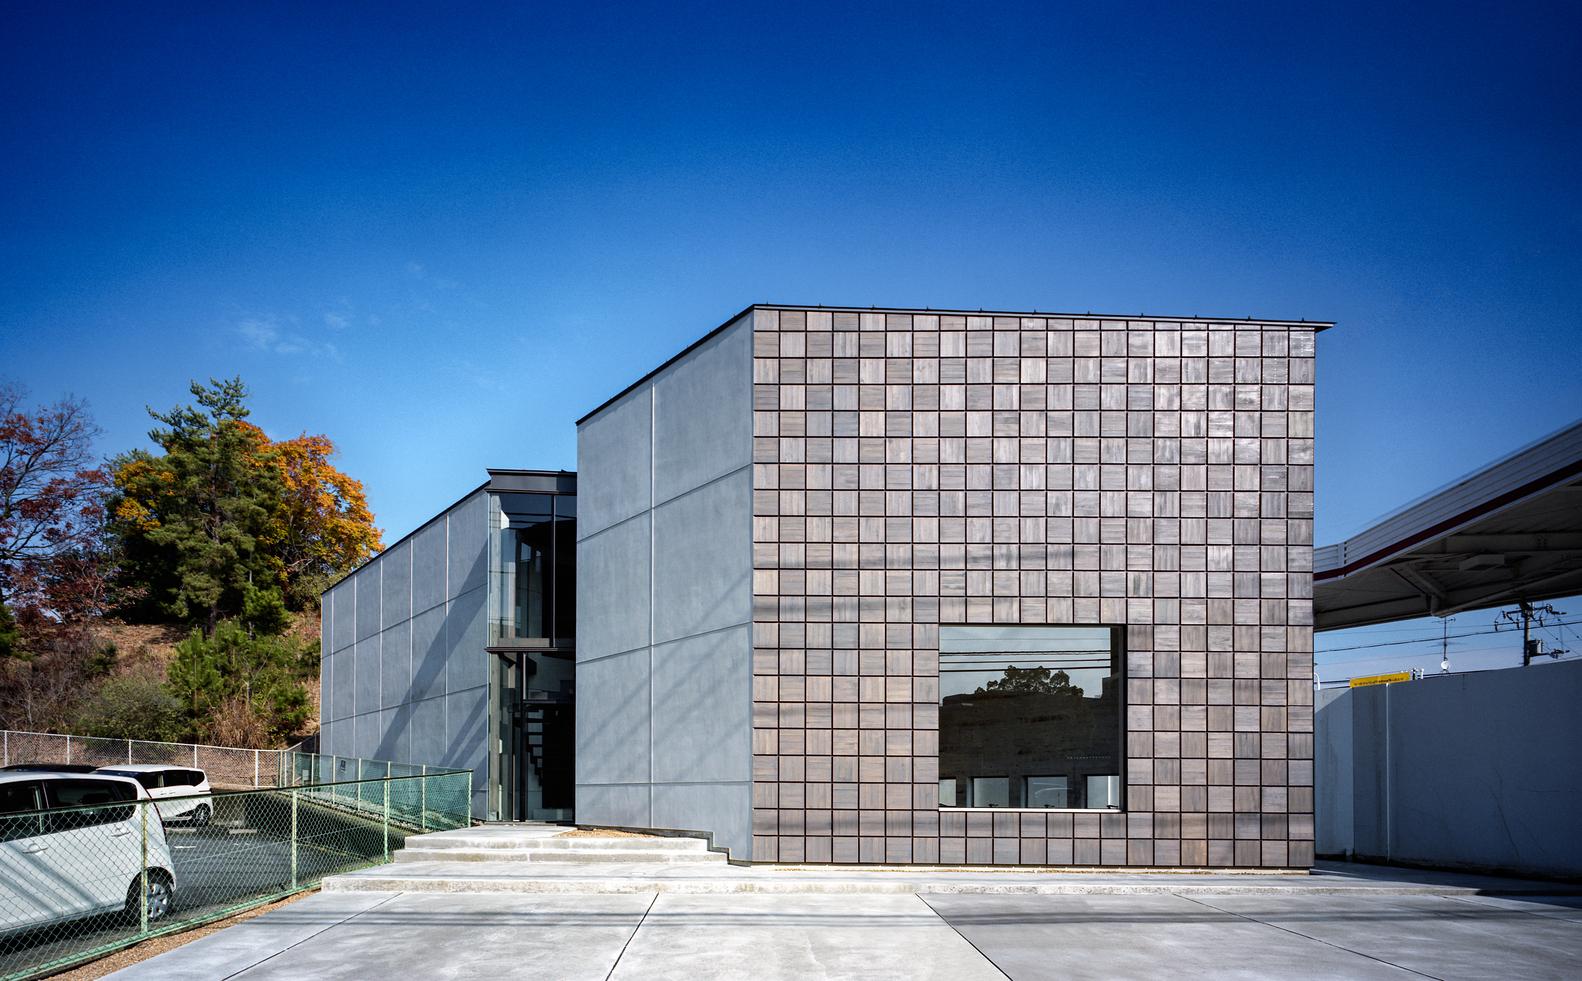 Store+House in Gakuenmae / FujiwaraMuro Architects